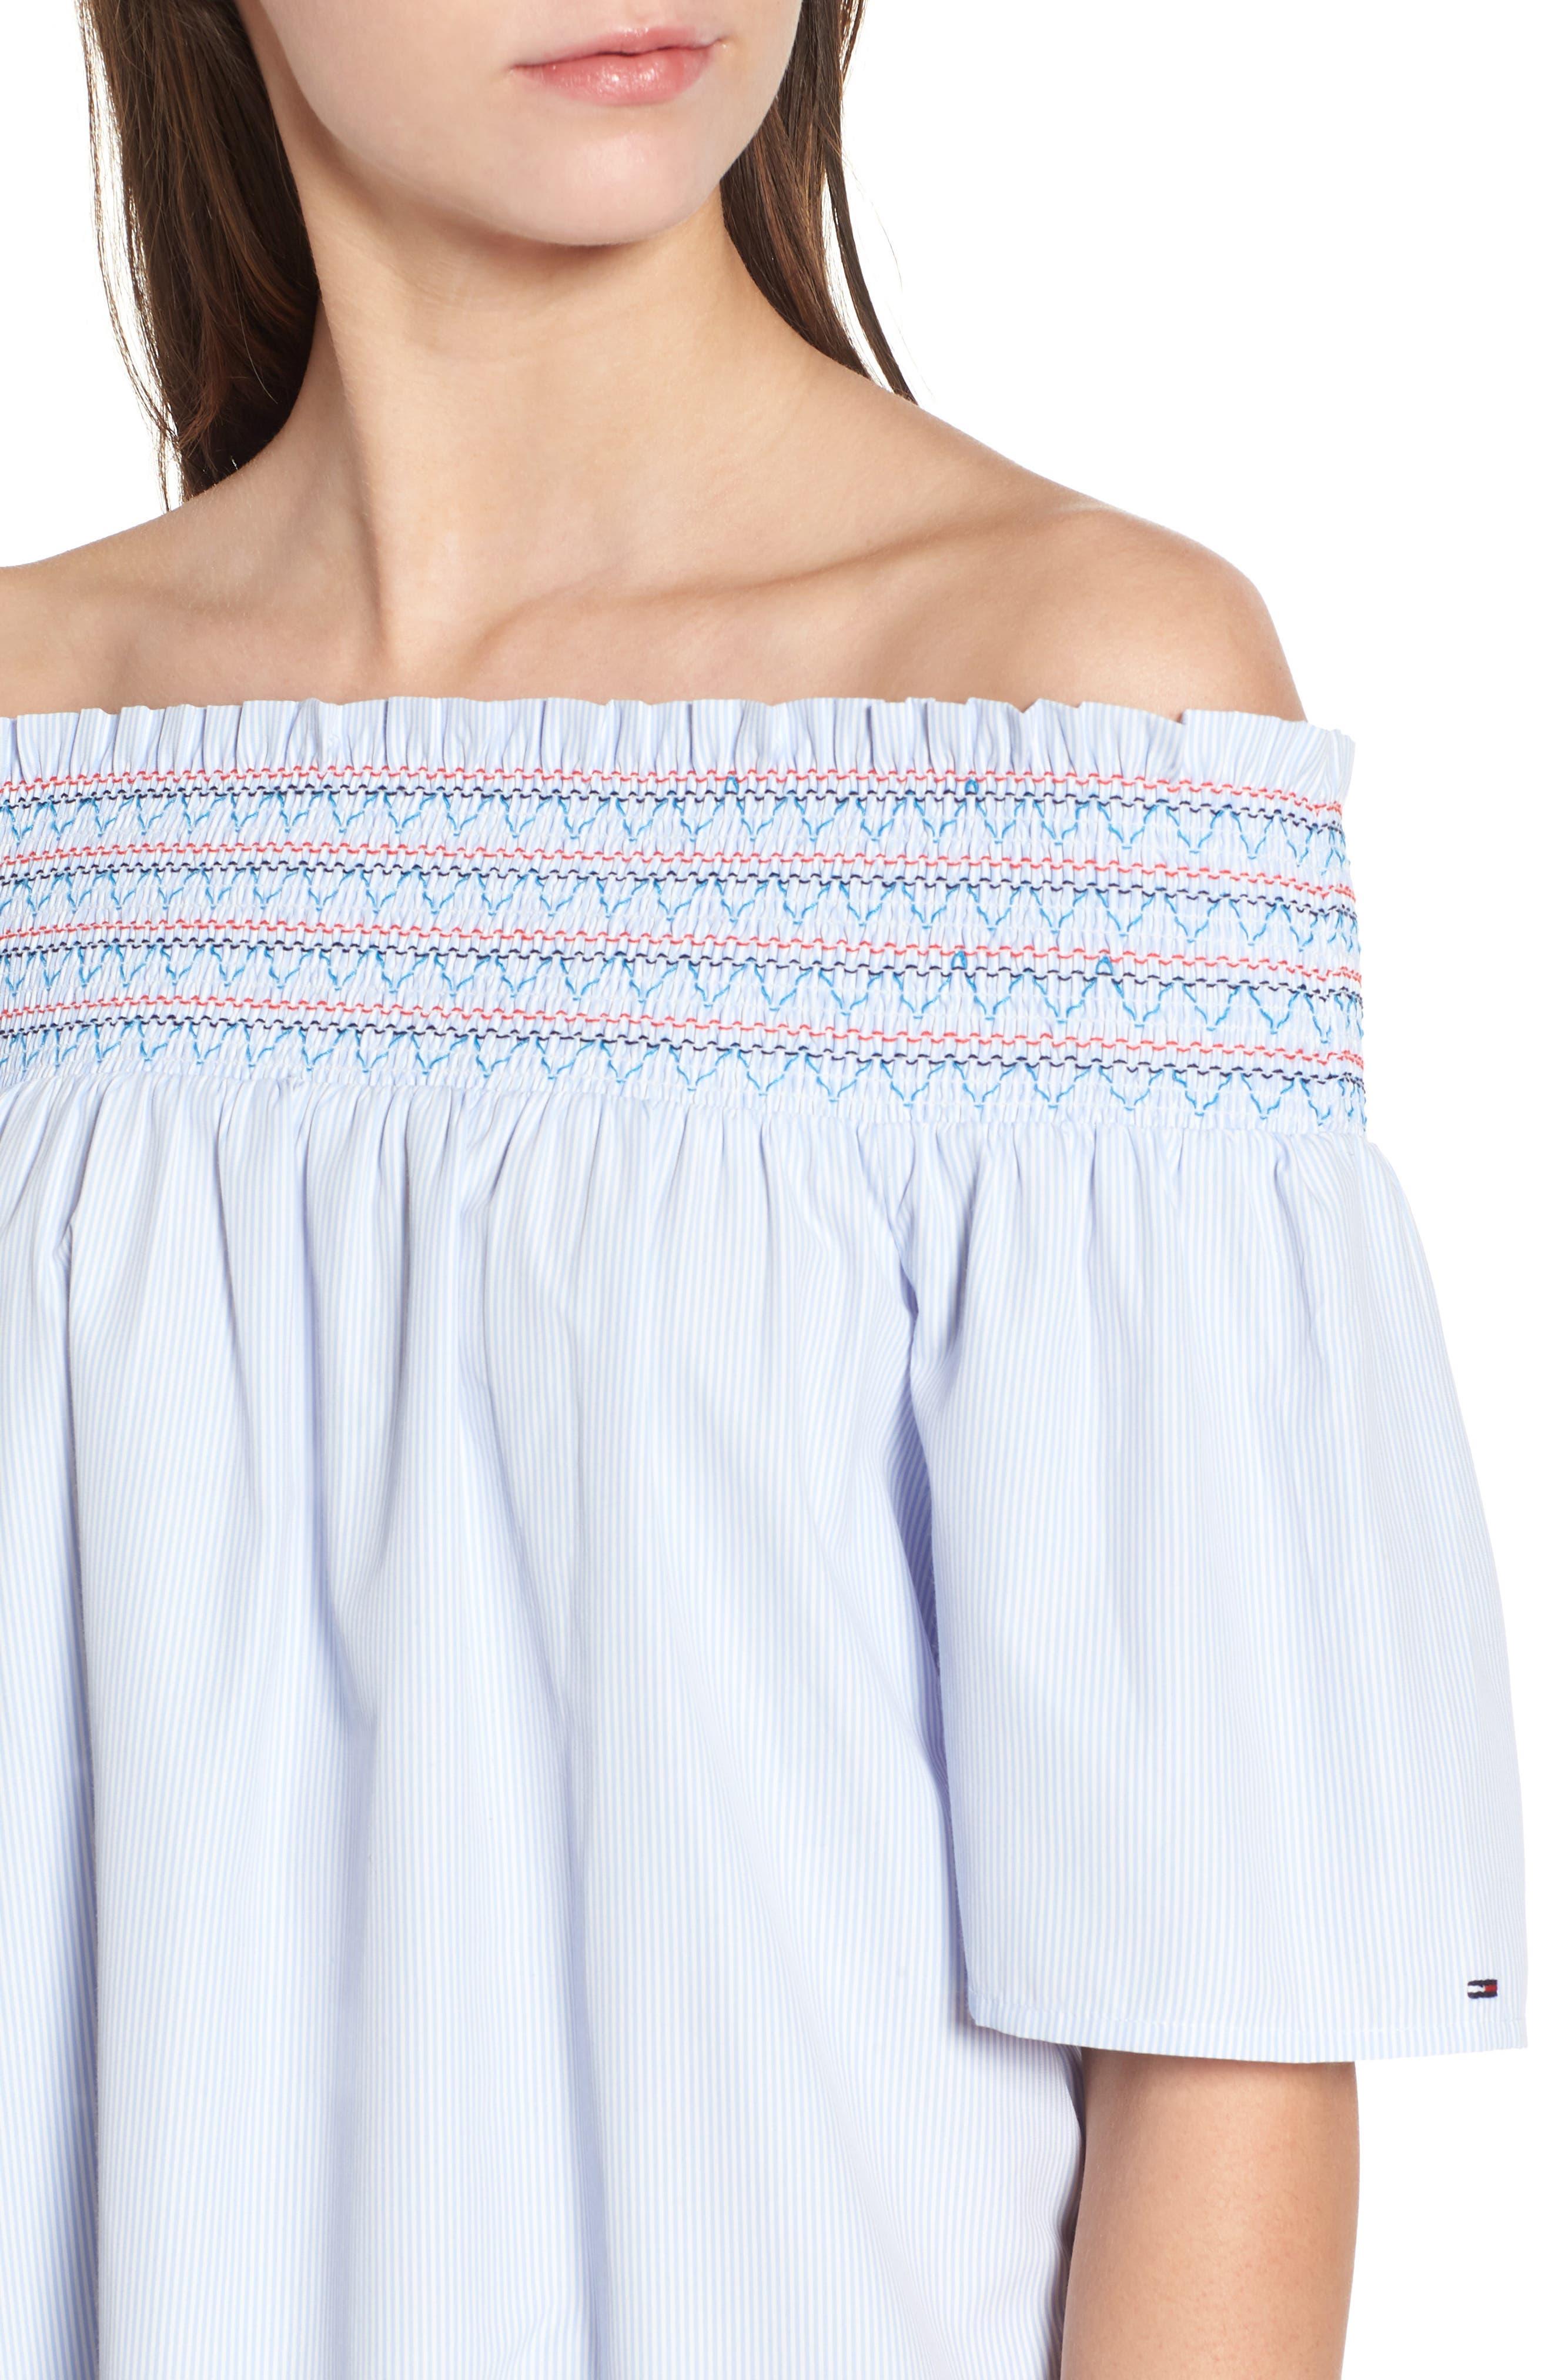 Smocked Off the Shoulder Dress,                             Alternate thumbnail 4, color,                             Bright White / Serenity